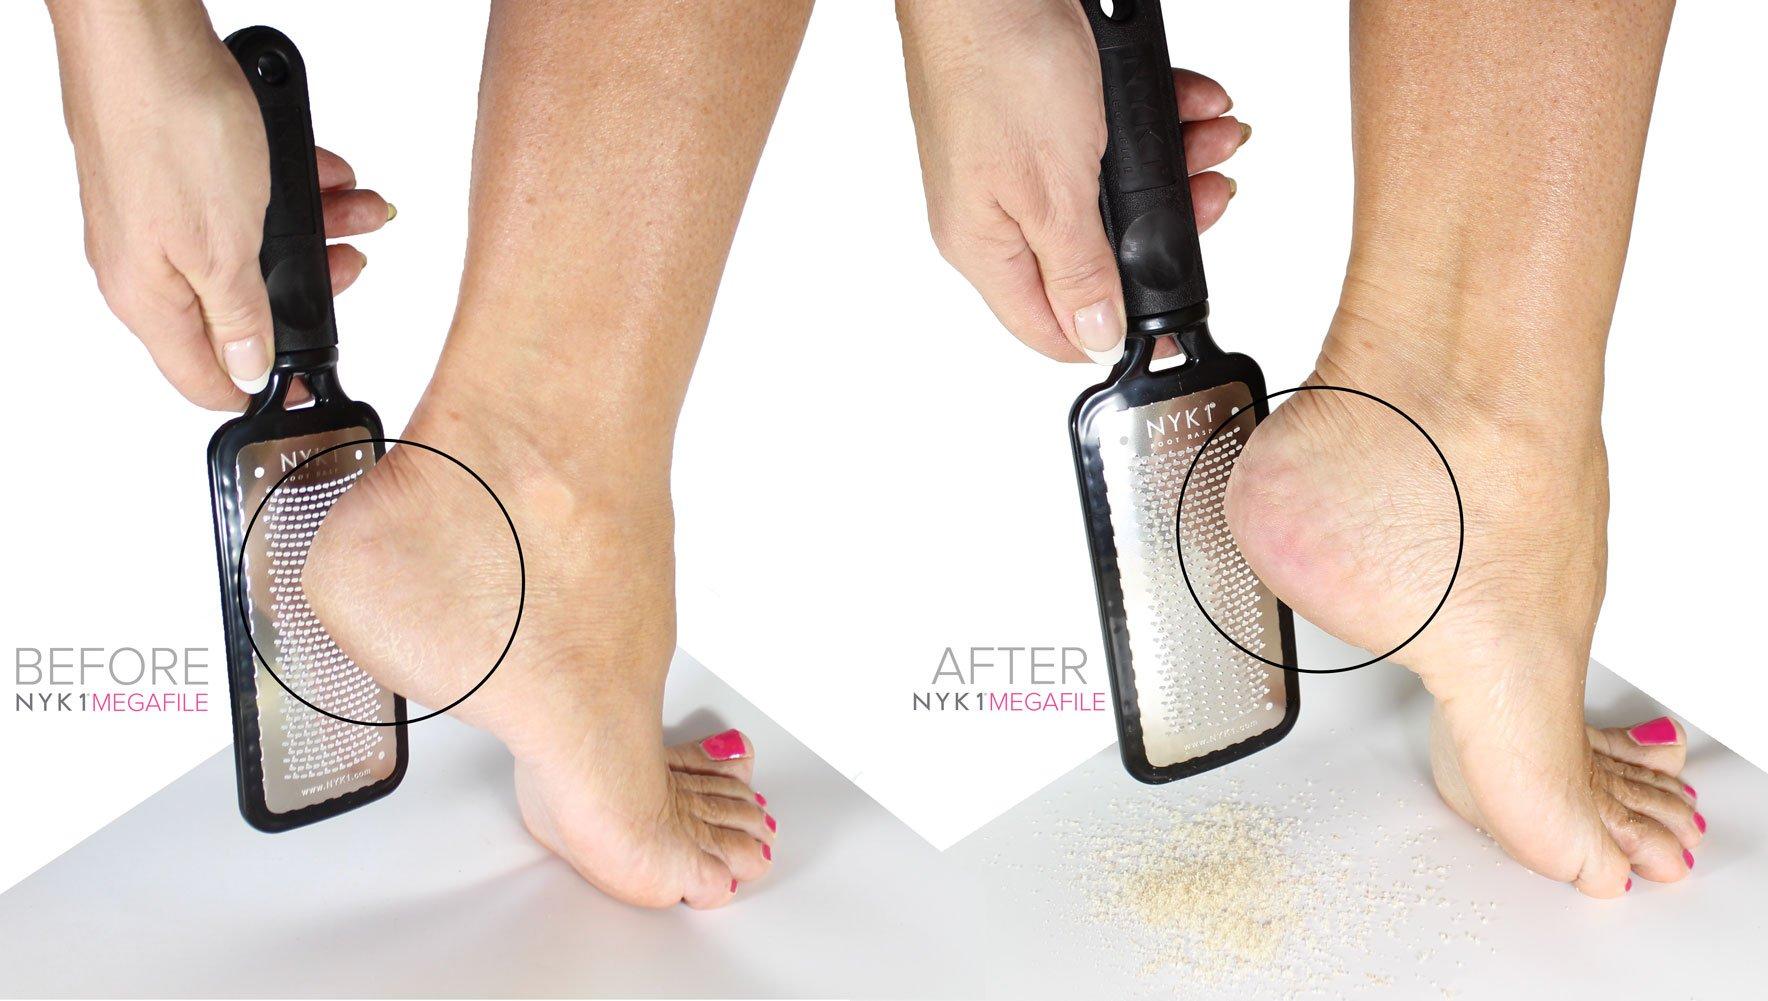 Hard Foot Skin Remover File - BEST MEGA Foot File Pedicure Rasp GENUINE MEGAFILE Professional Heel Care Callus Dry Dead Skin Egg Corn Sander Scrubber Pumice Stone Alt Ped Pedi Feet Grater Add on Item by NYK1 (Image #6)